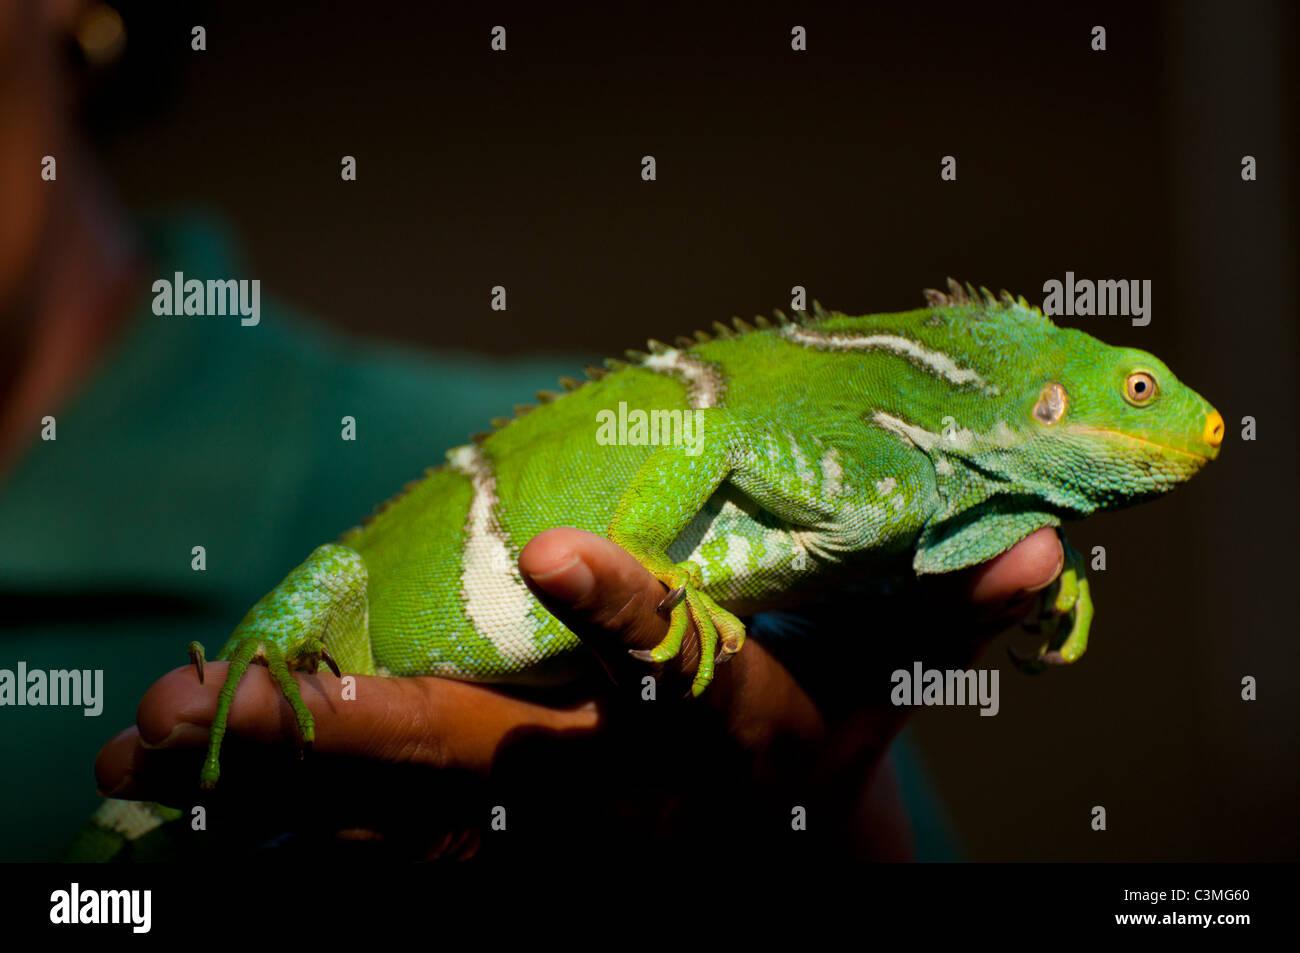 Crested Iguana, Kula Eco Park, Sigatoka, Coral Coast Viti Levu Island, Fiji - Stock Image